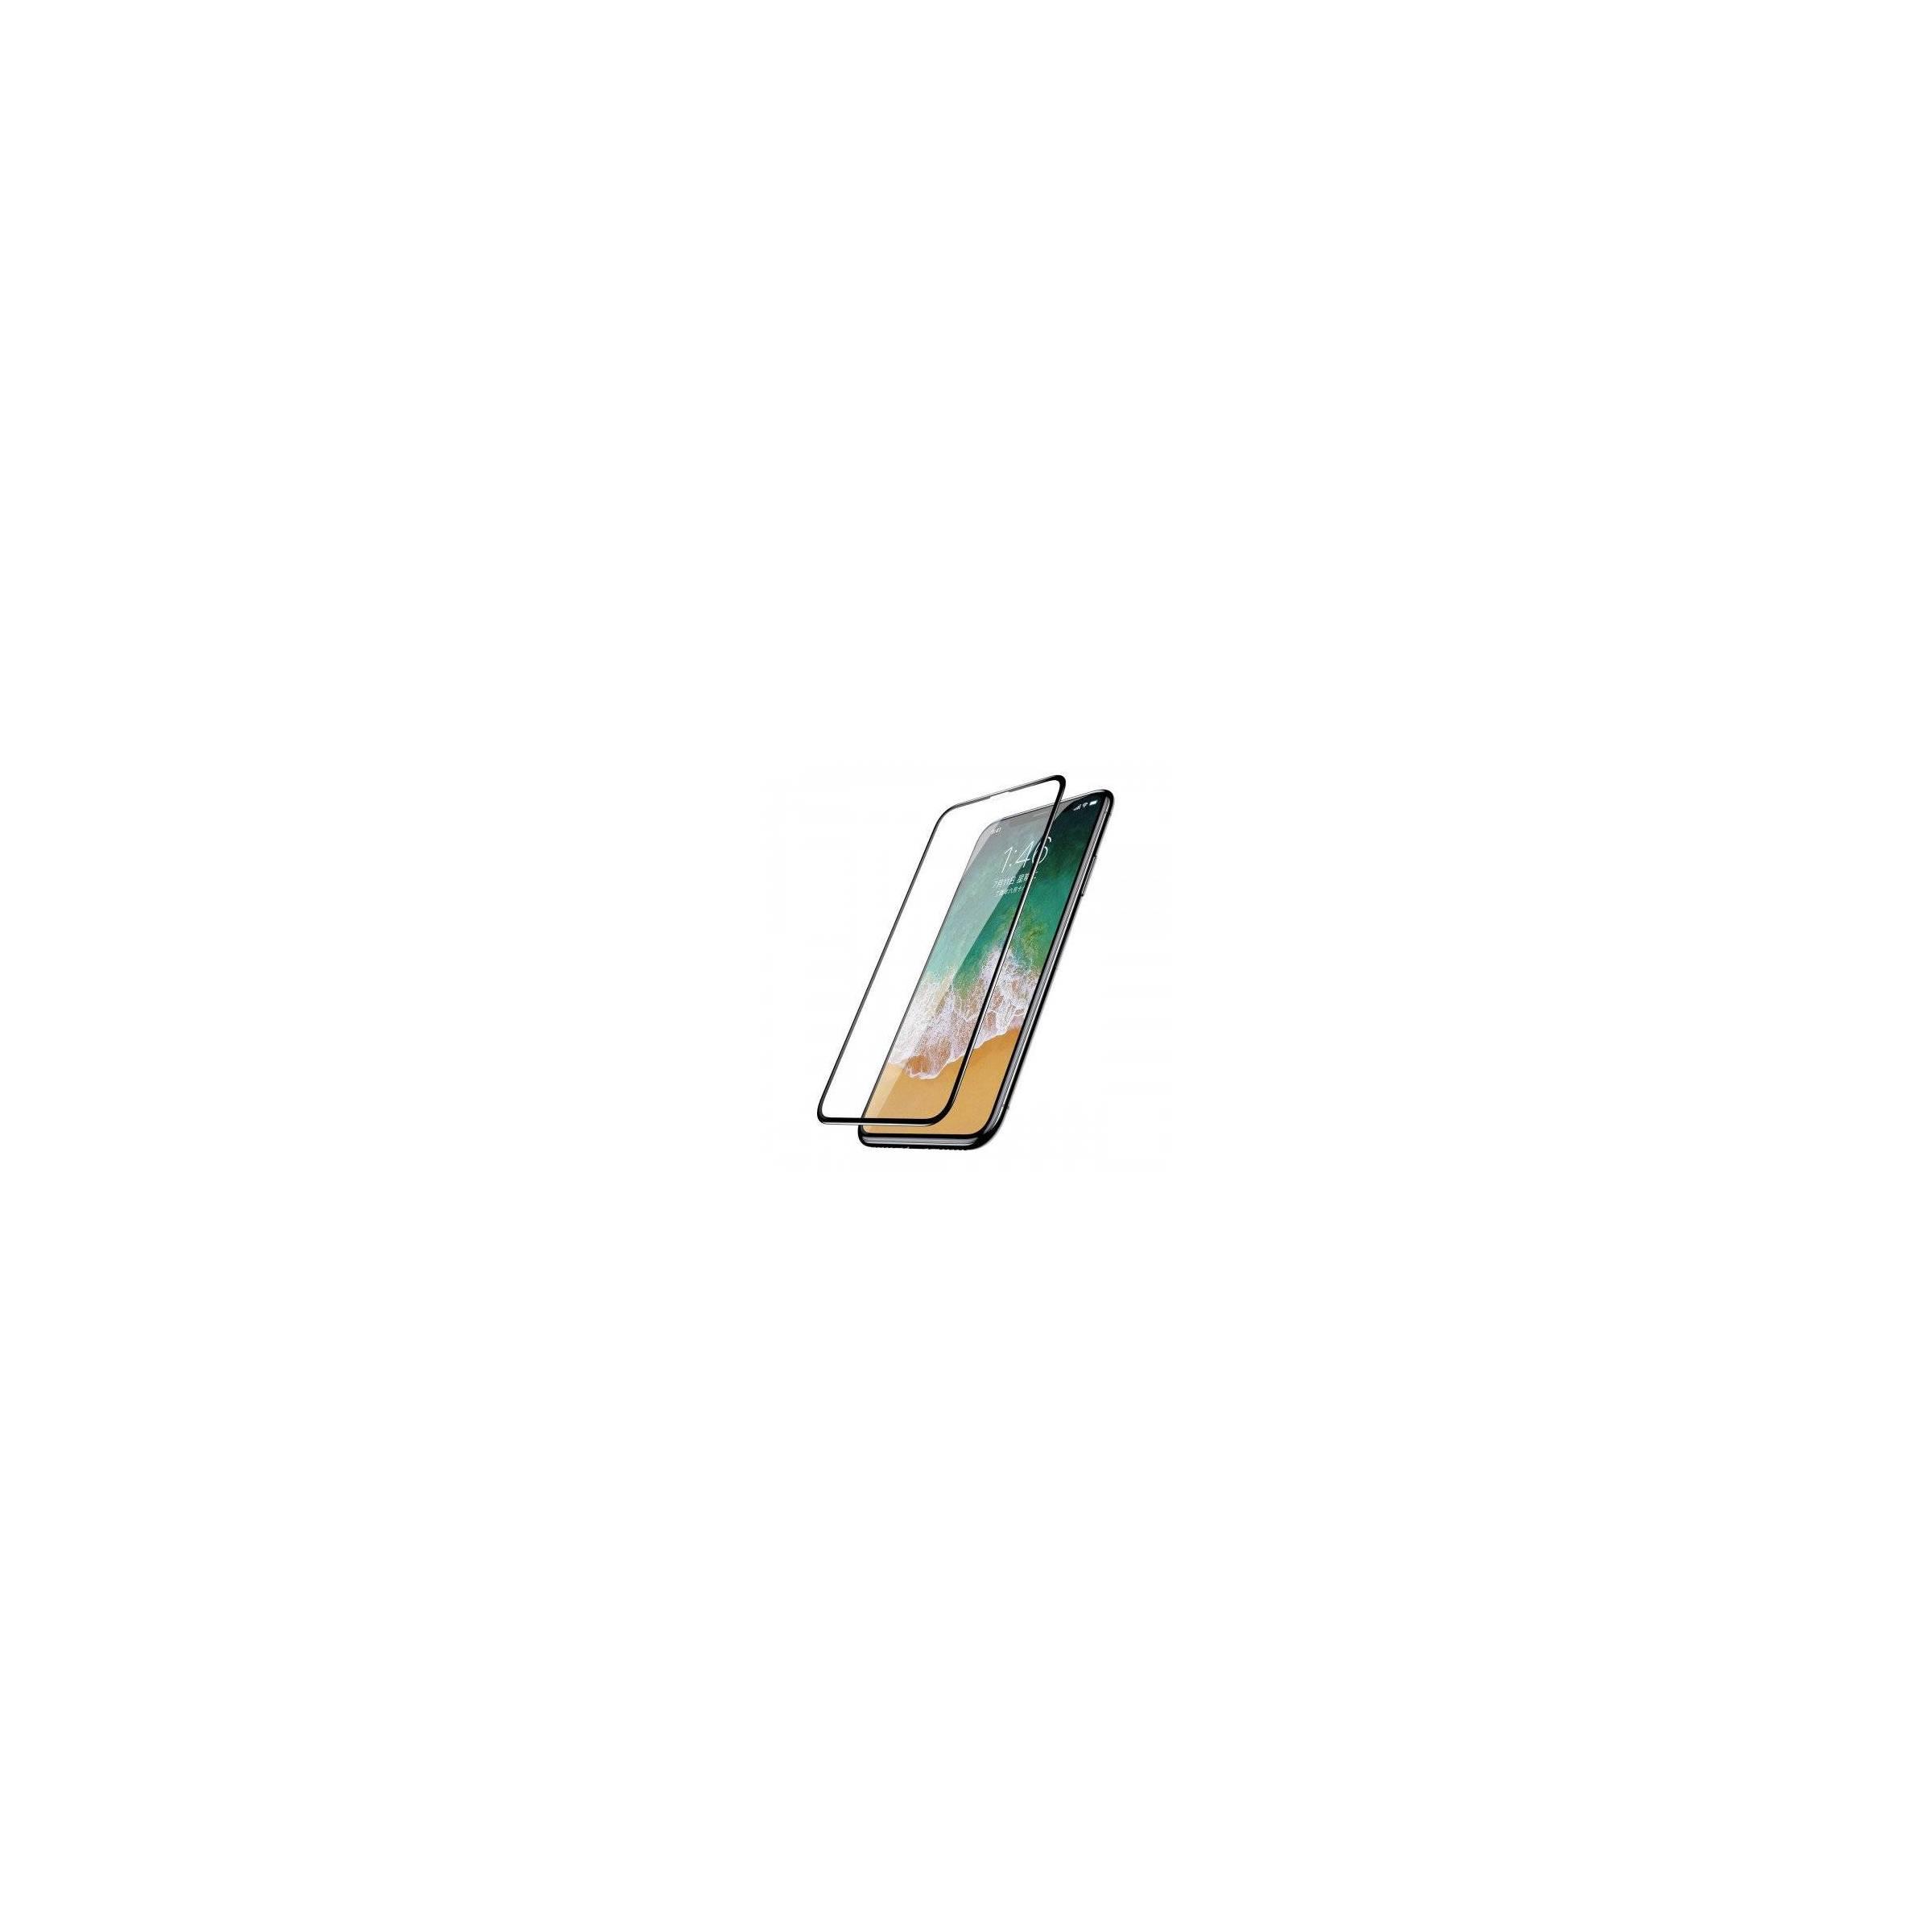 Baseus iphone x/xs beskyttelsesglas med kant fra baseus fra mackabler.dk